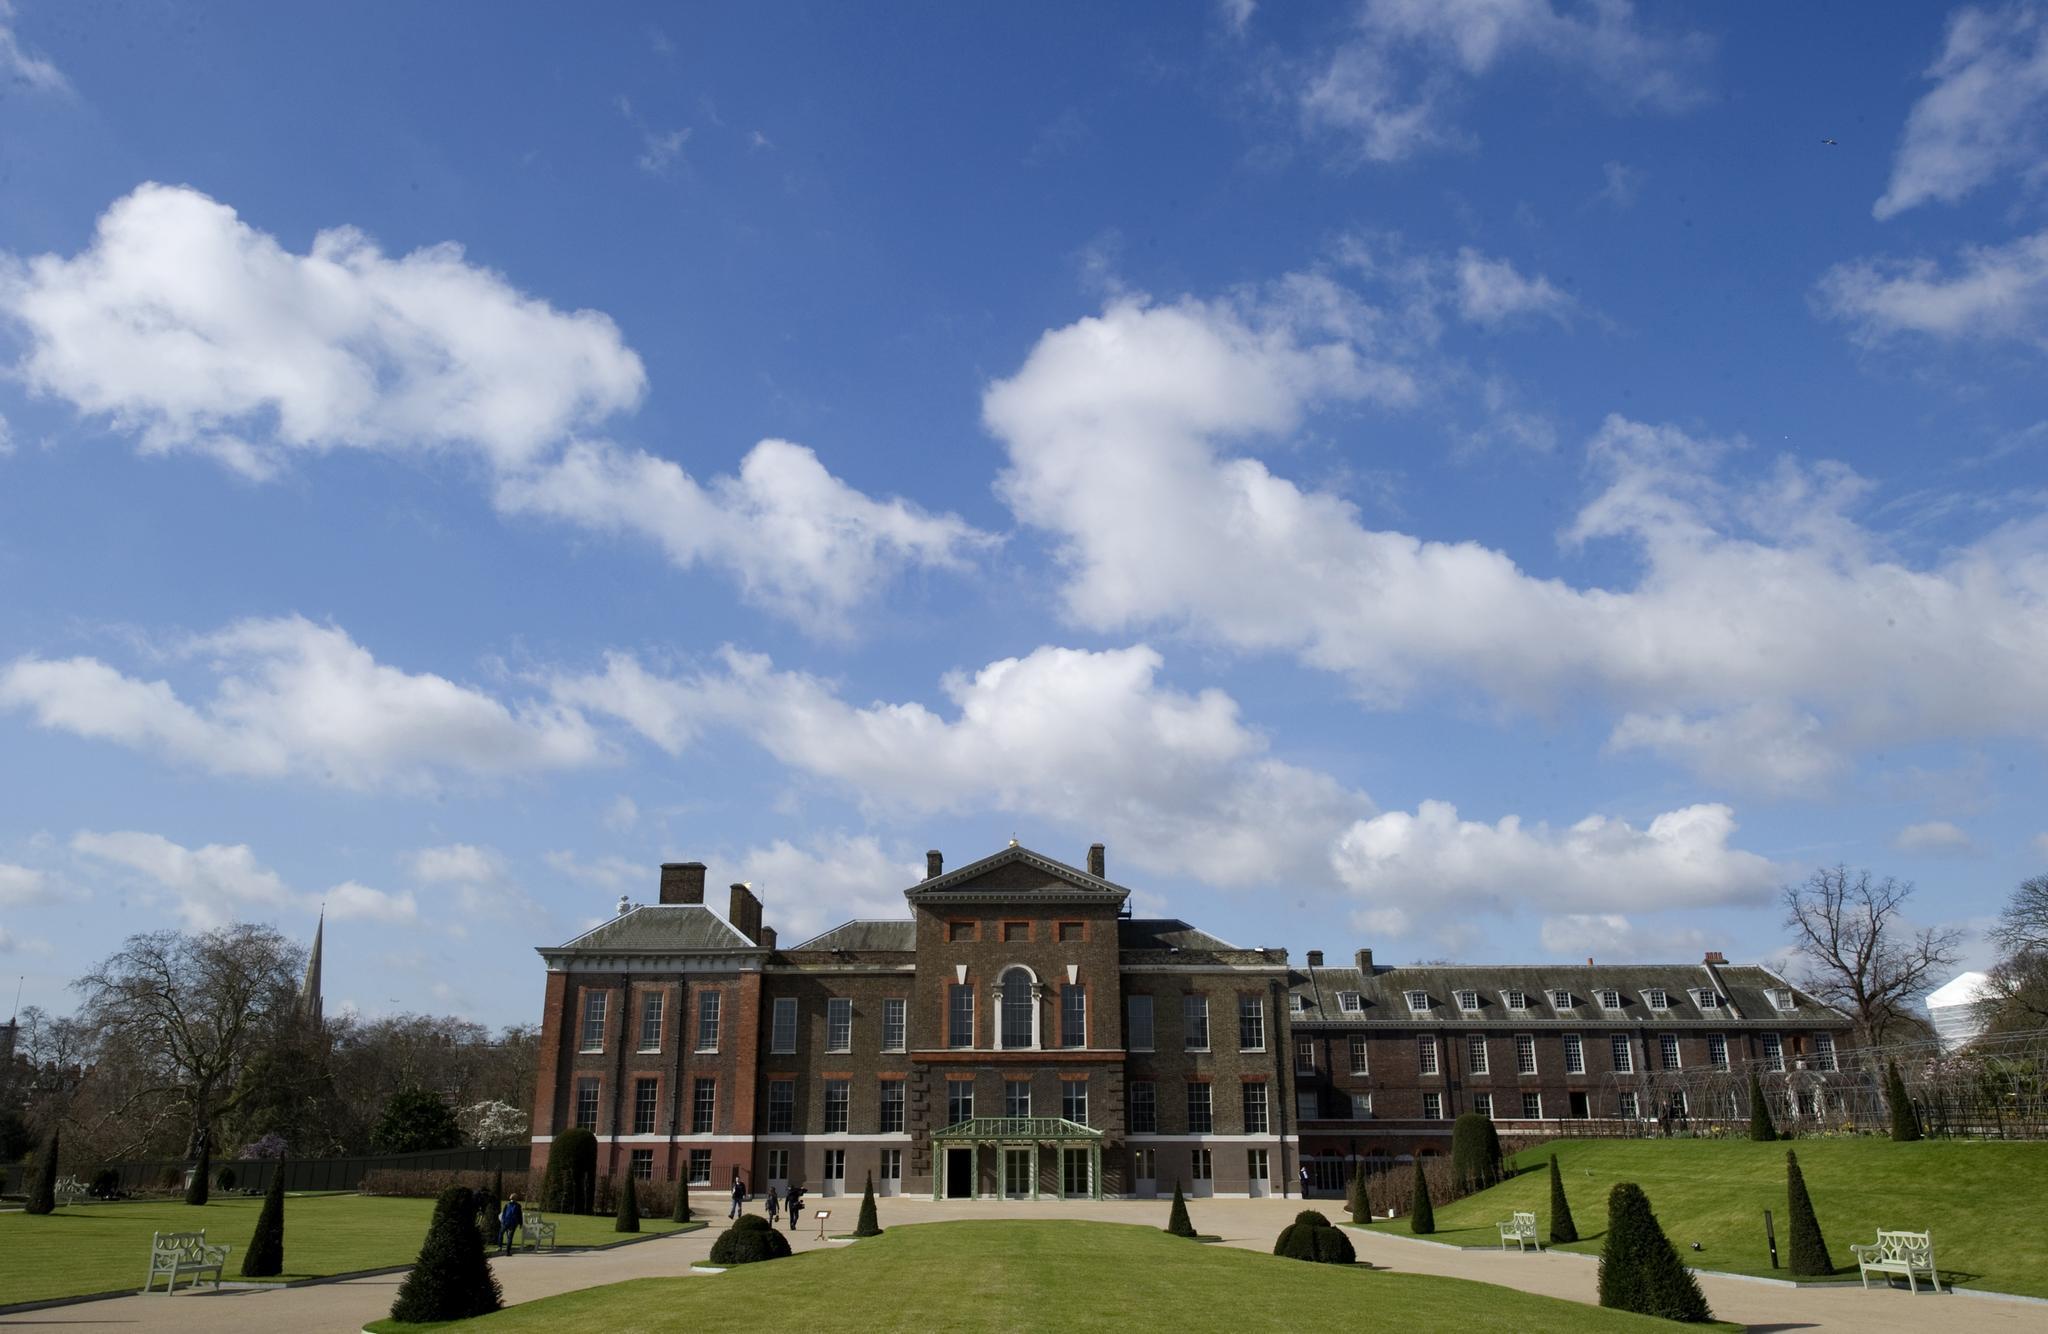 Kensington-Palast